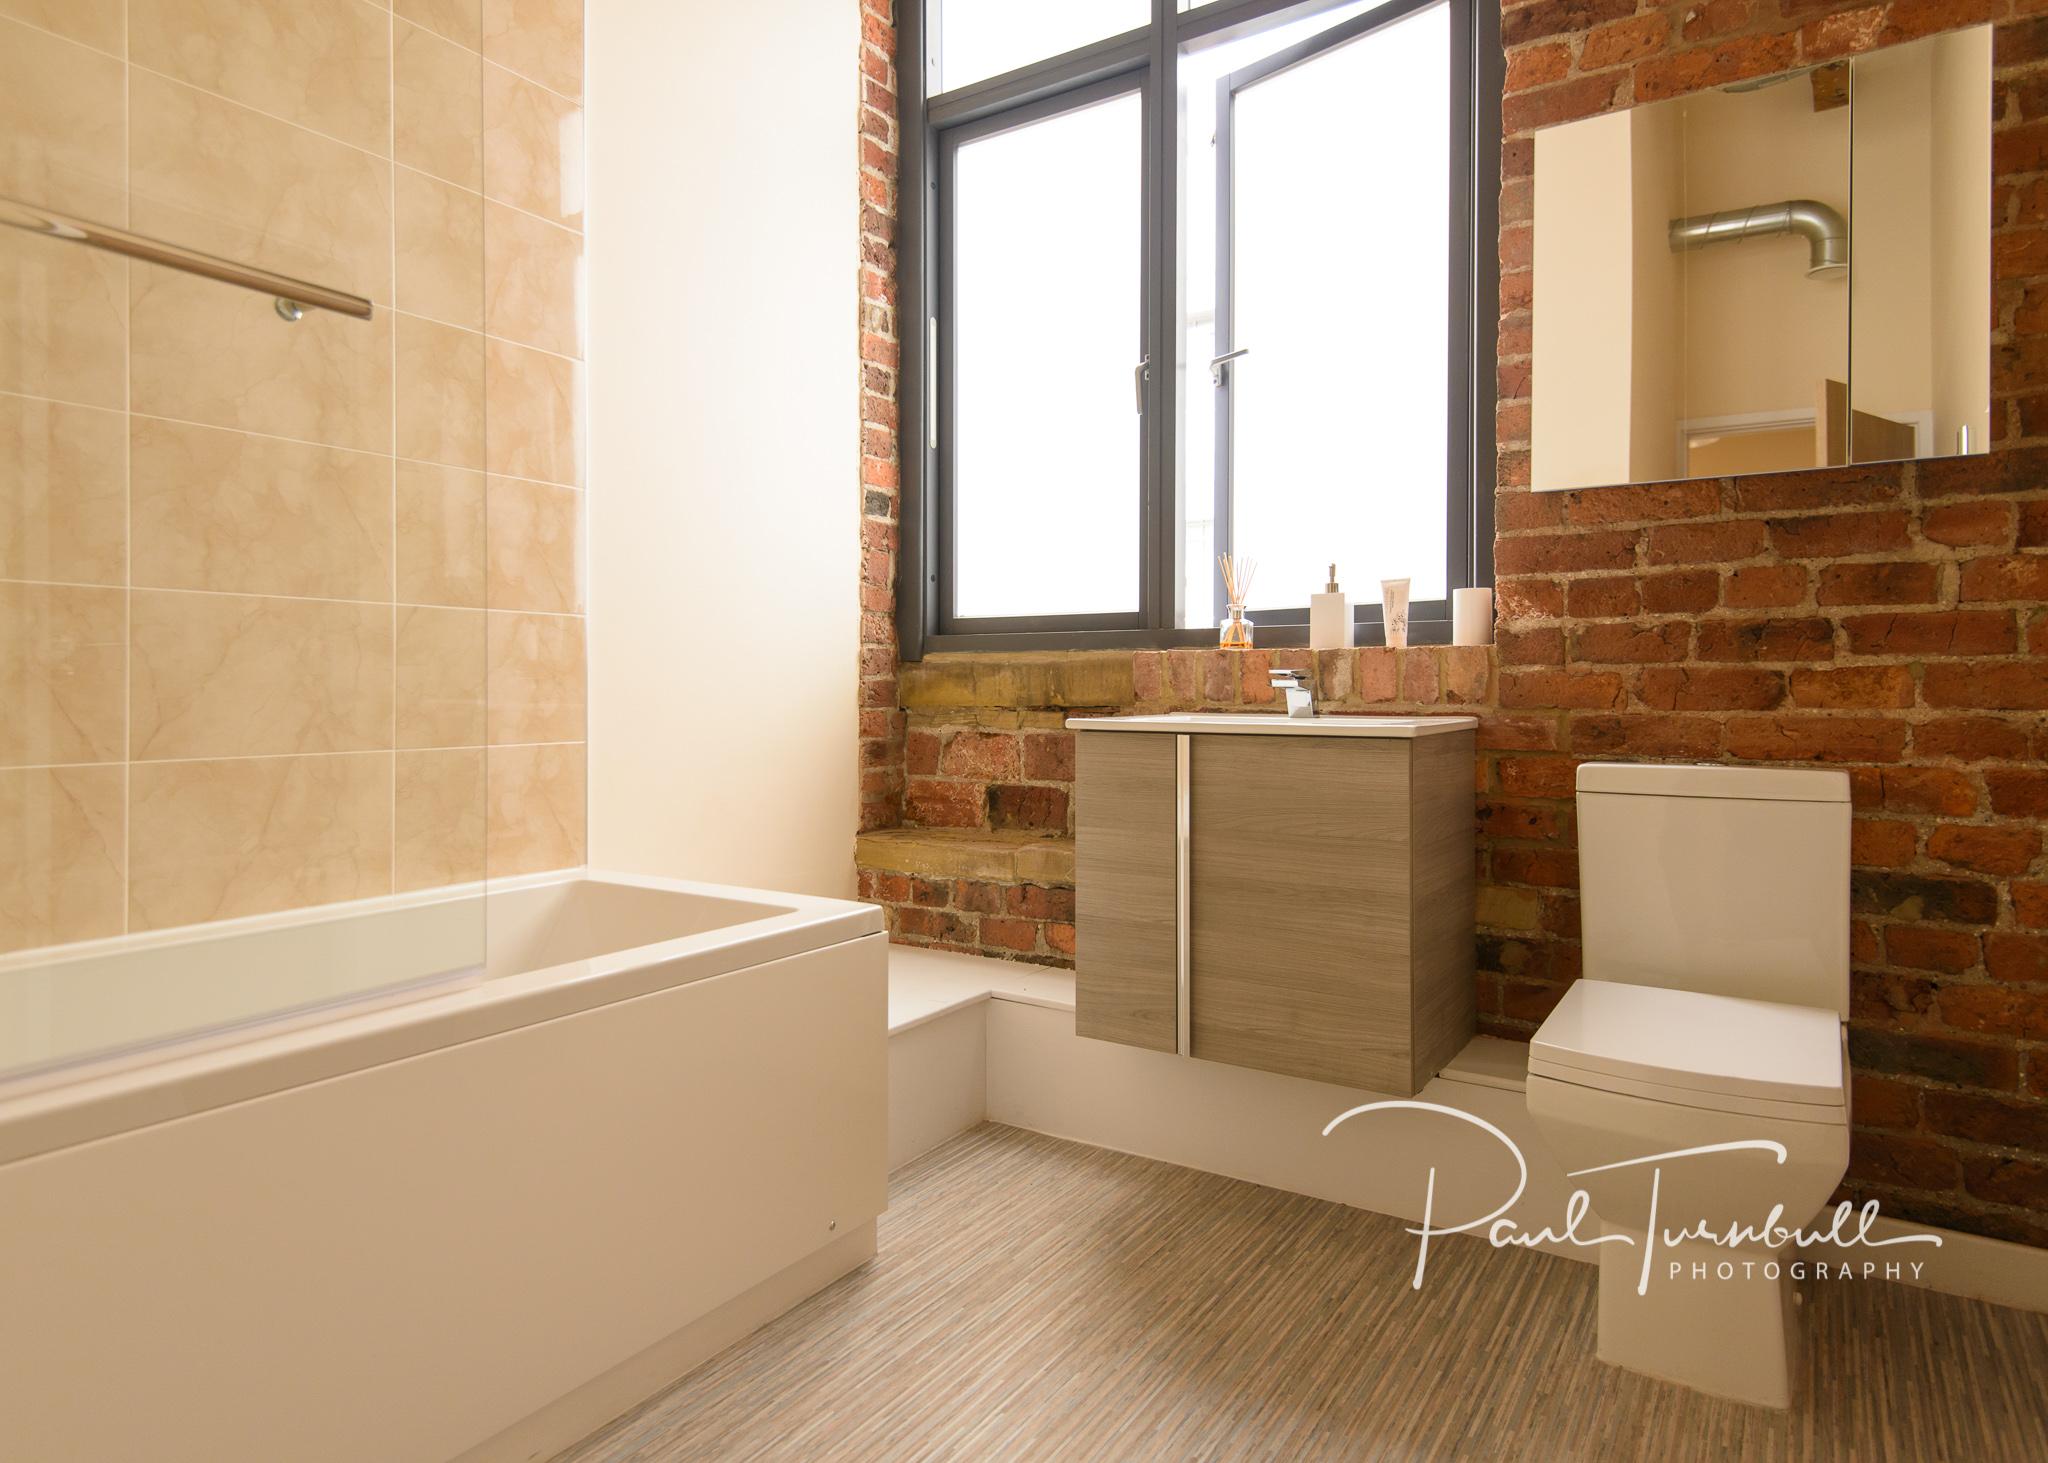 commercial-property-photographer-leeds-yorkshire-blackbrook-developments-027.jpg